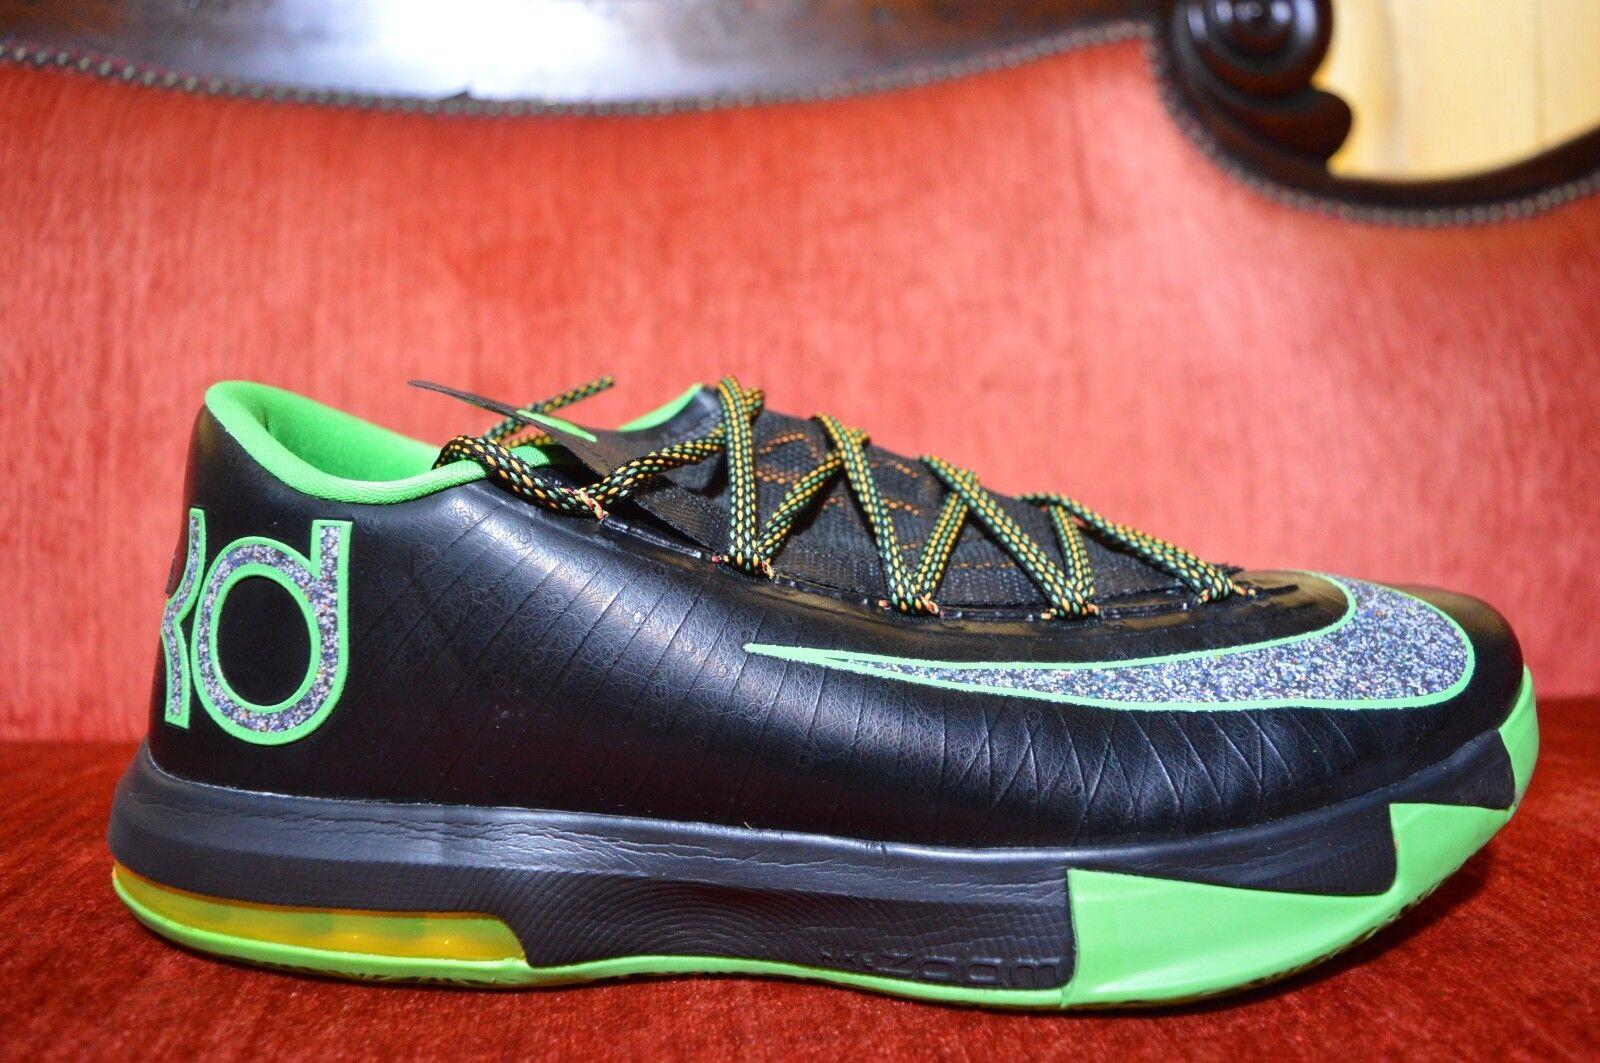 Nike KD 6 VI Basketball Shoes Brazil 10M Black Lucid Green 599424-093 Comfortable